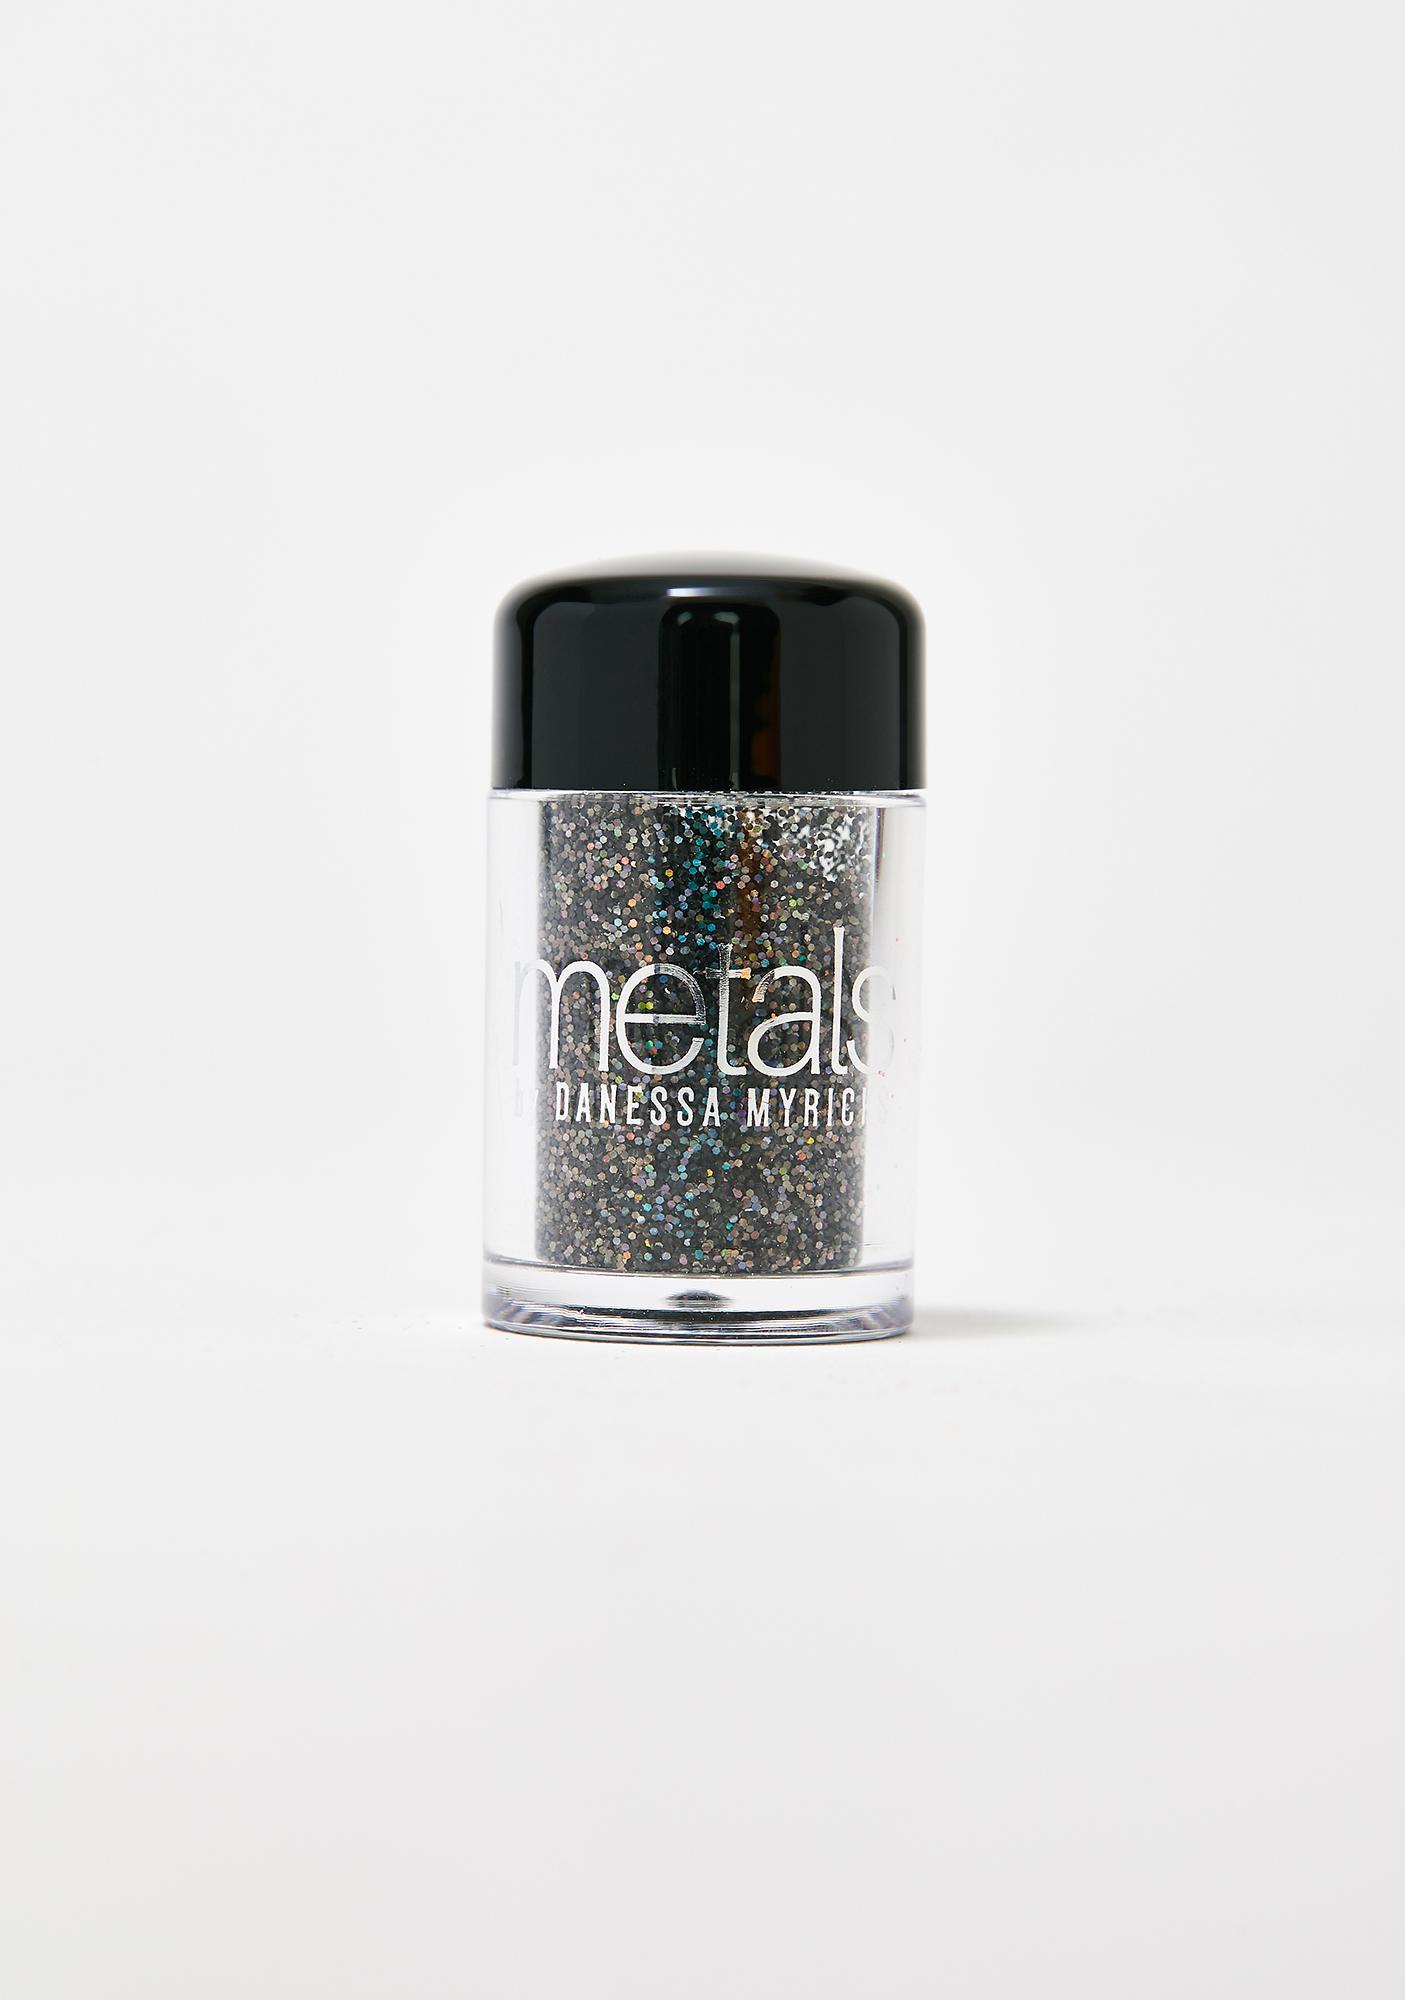 Danessa Myricks Beauty Black Star Glitter